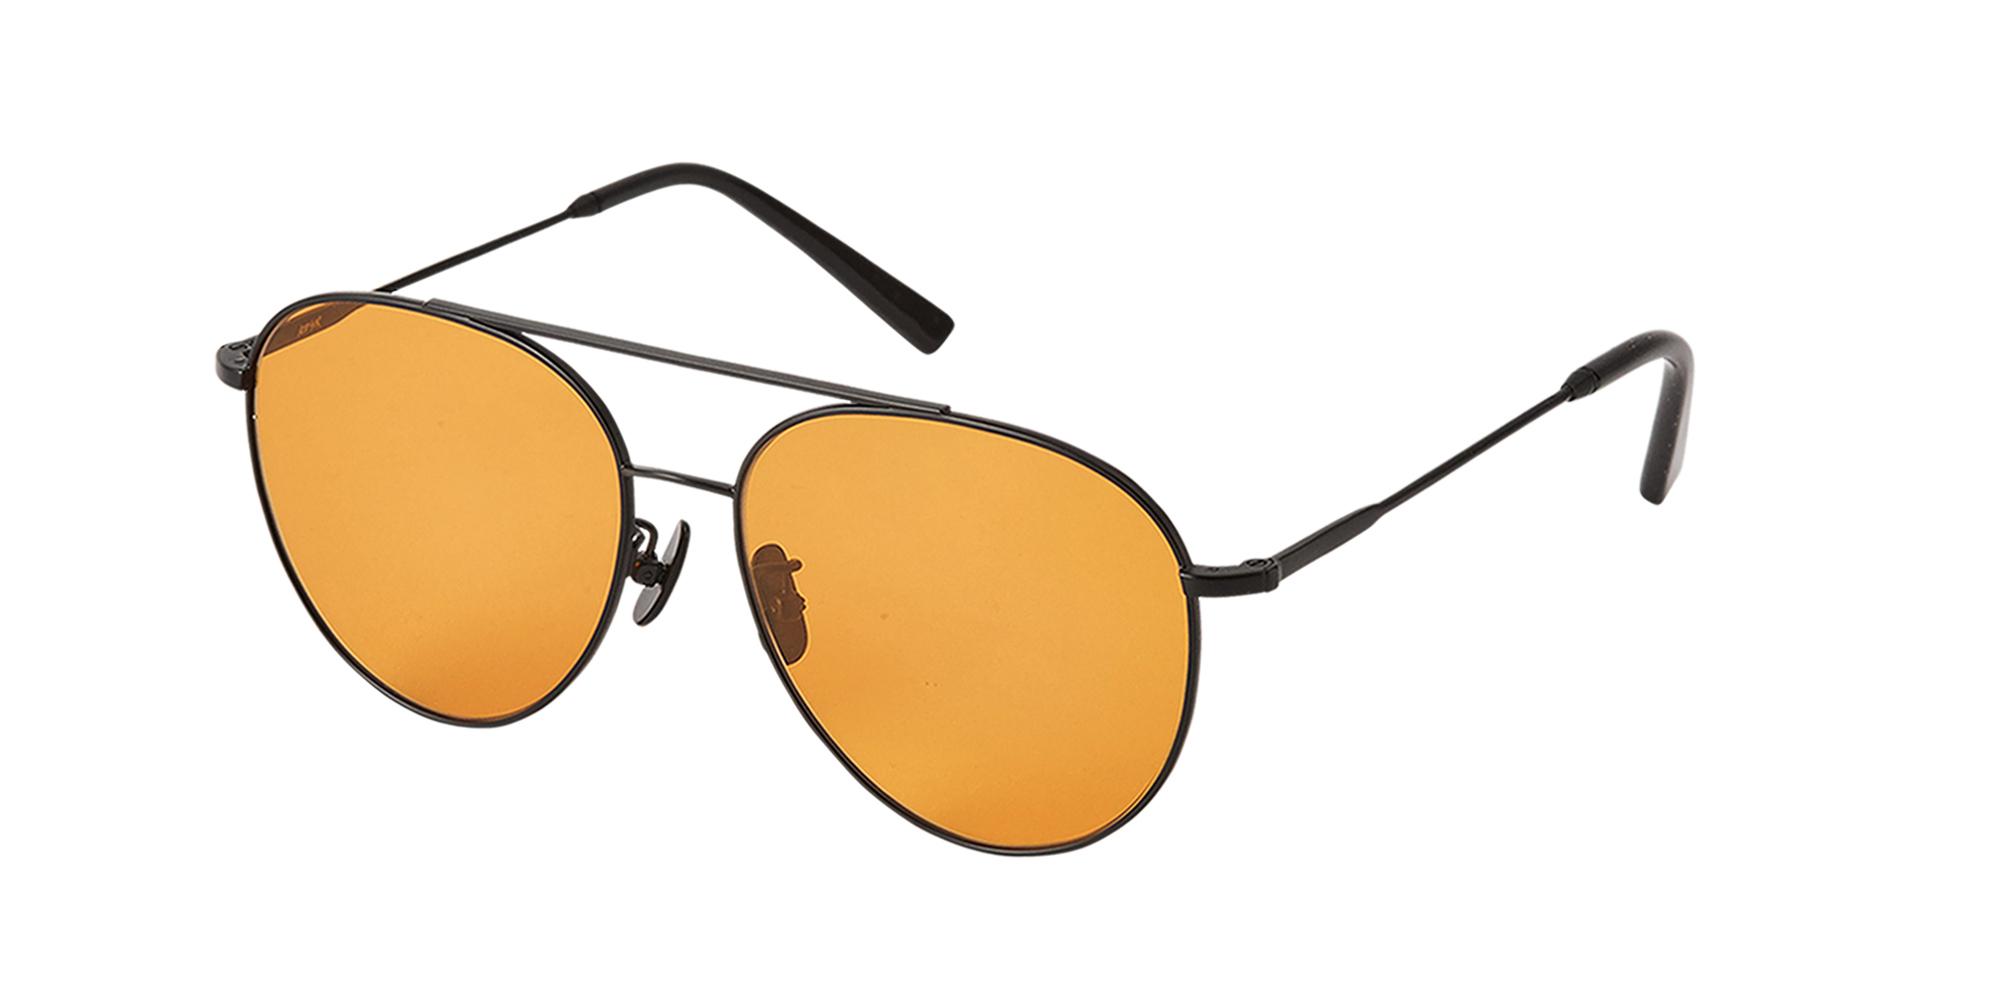 A.D.S.R IRENE 01-Orange